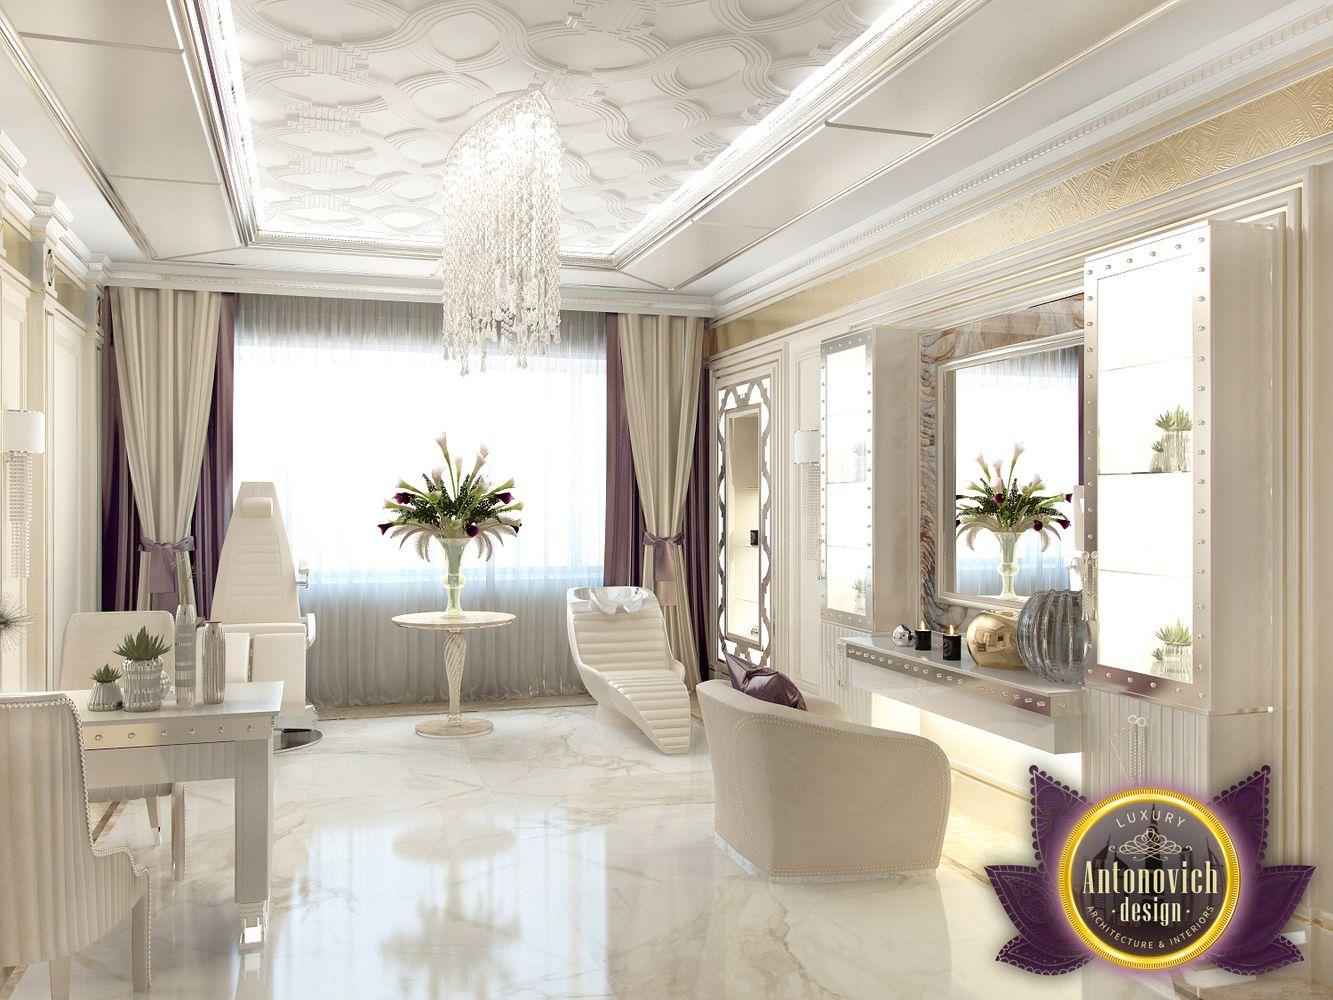 LUXURY ANTONOVICH DESIGN UAE: Design of interior beauty salon of ...